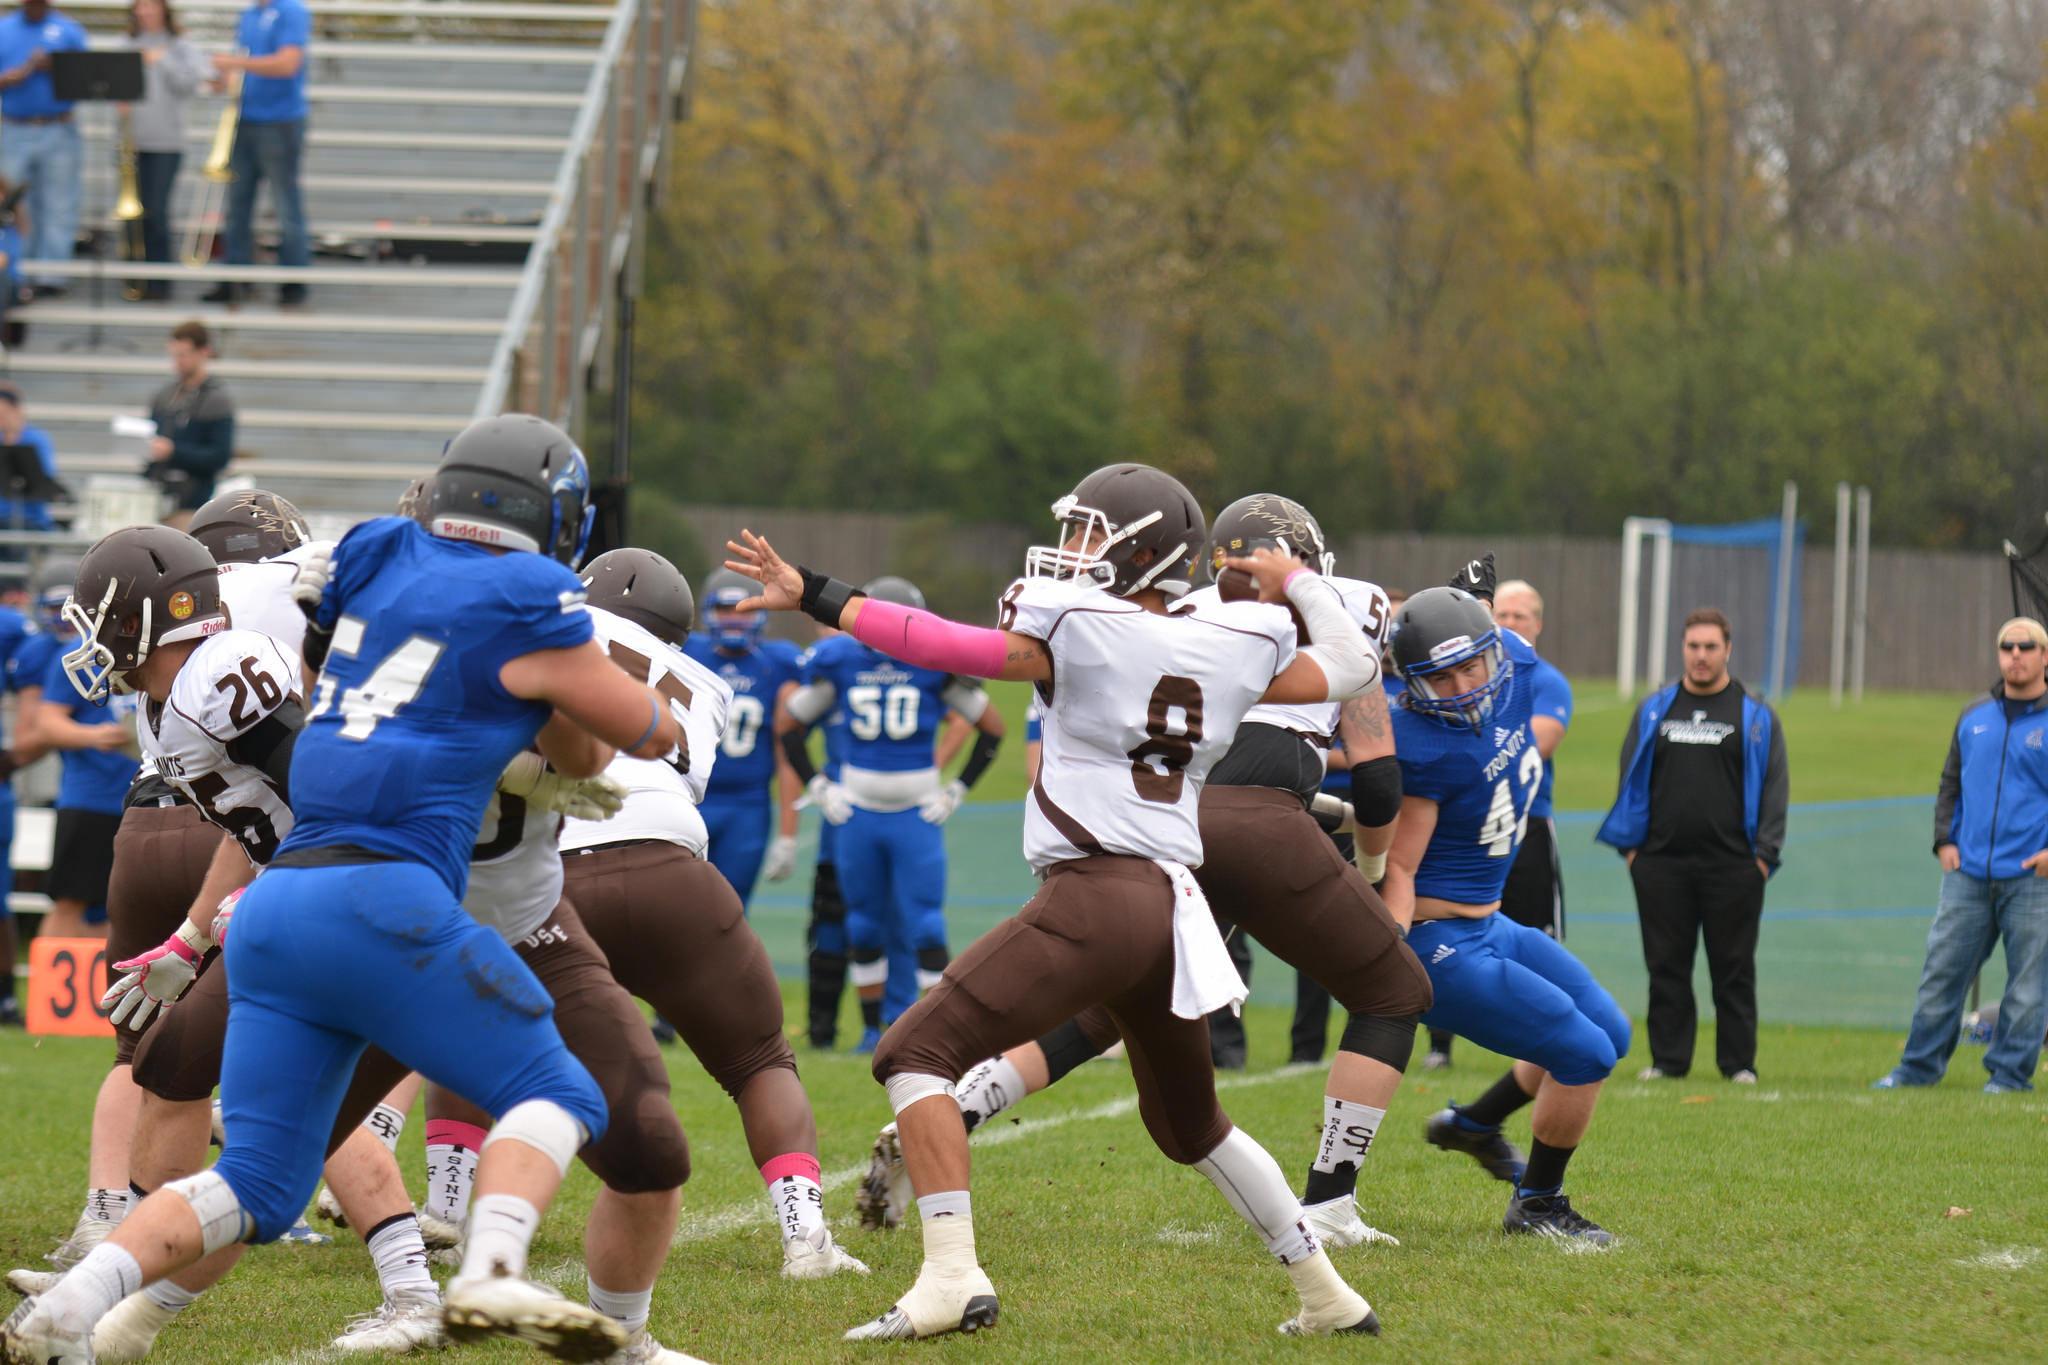 University of St. Francis quarterback Don Butkus throws a pass.